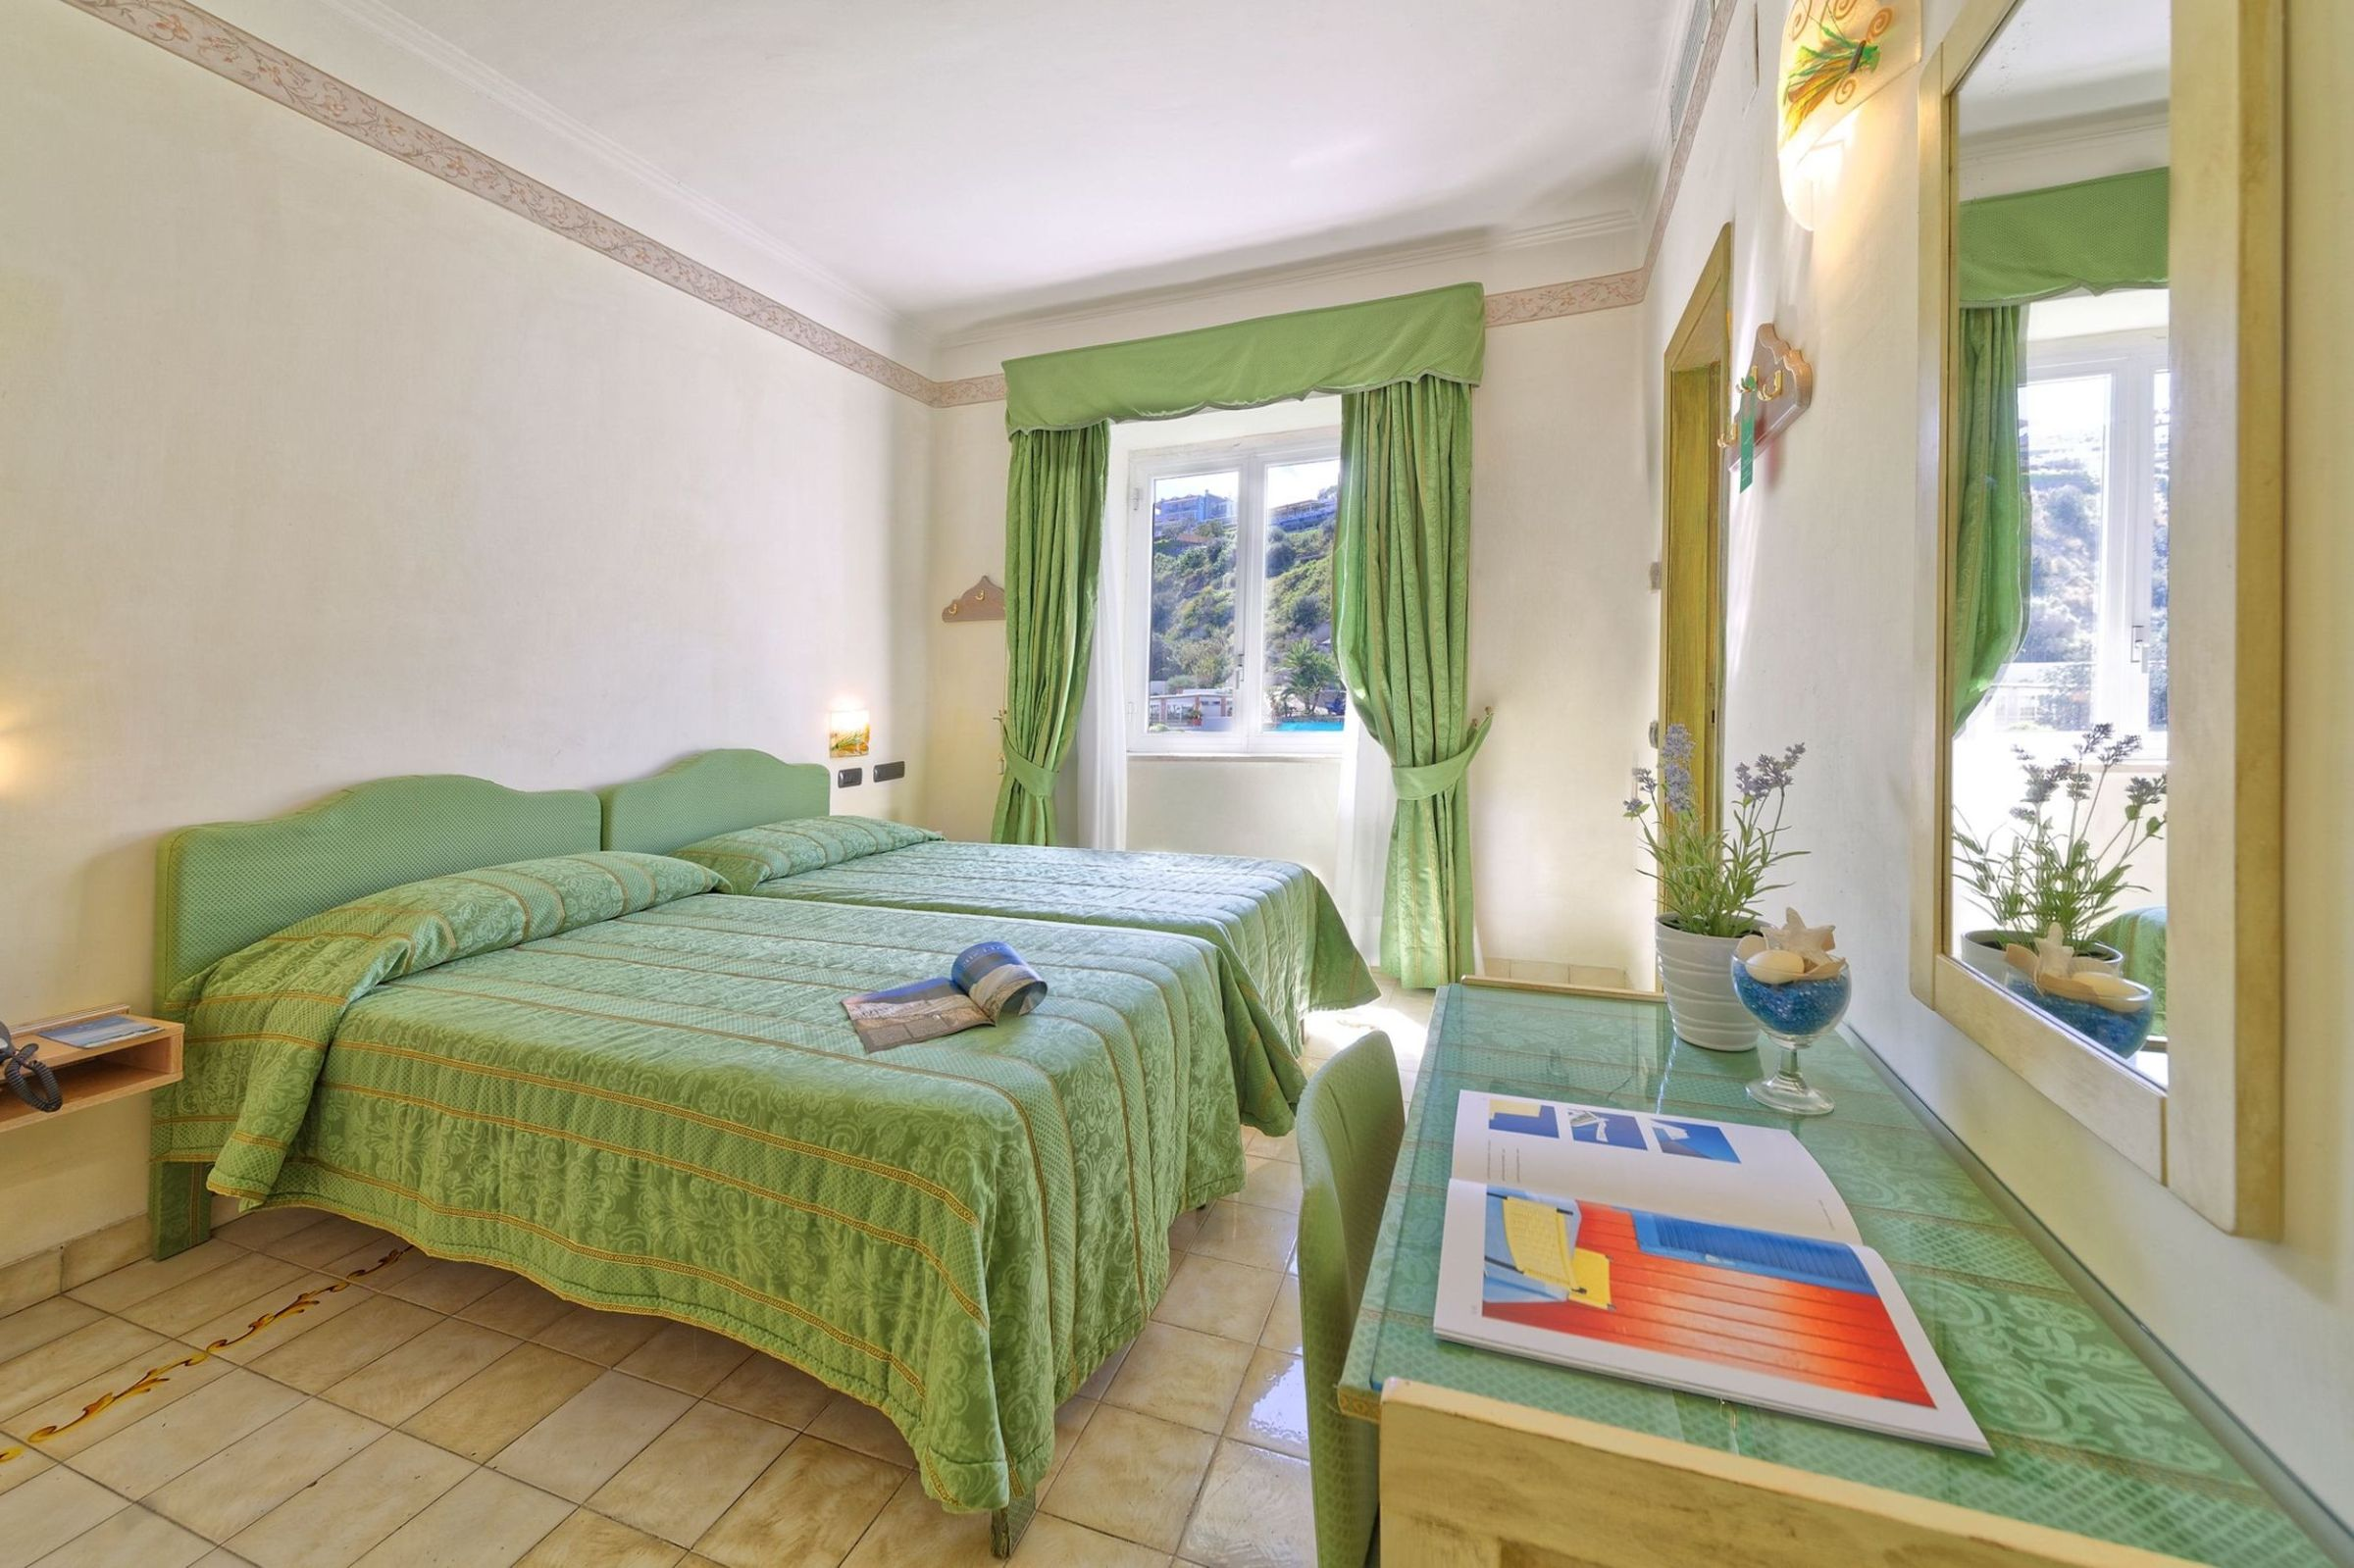 Hotel Forio d\'Ischia 4 Stelle|Hotel Spiaggia Citara